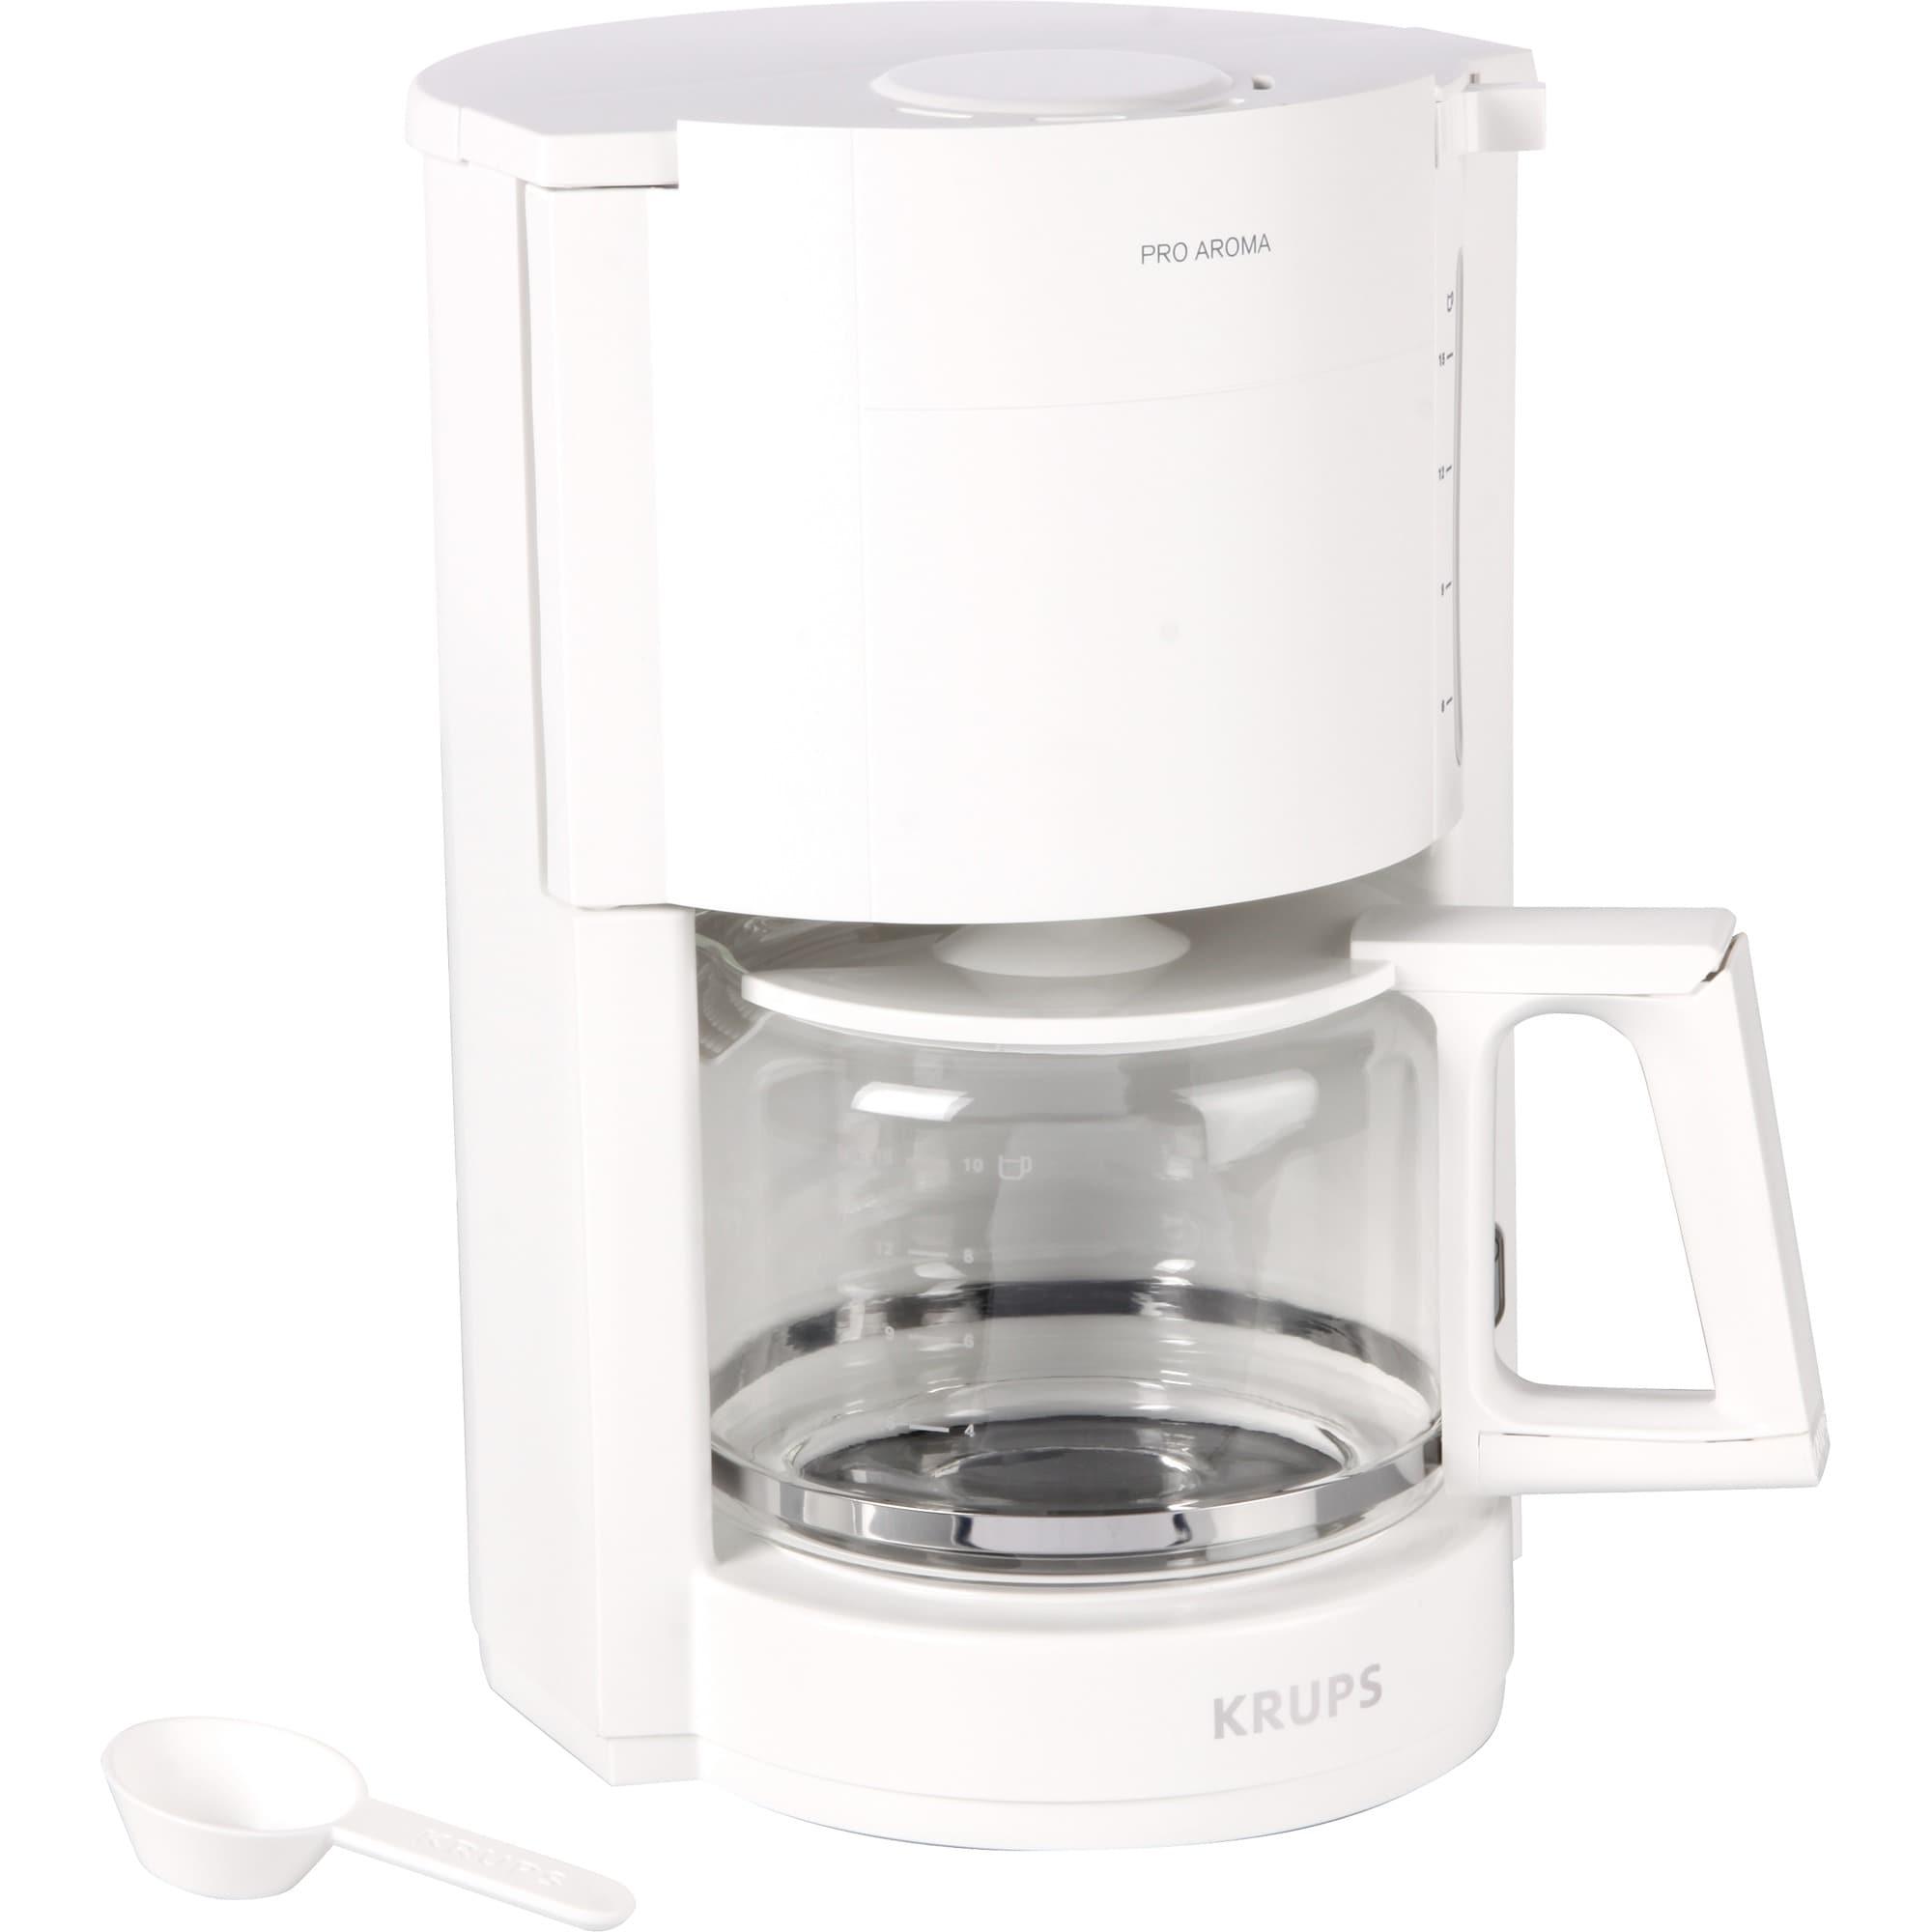 Krups Filtermaschine F 309 01 ProAroma